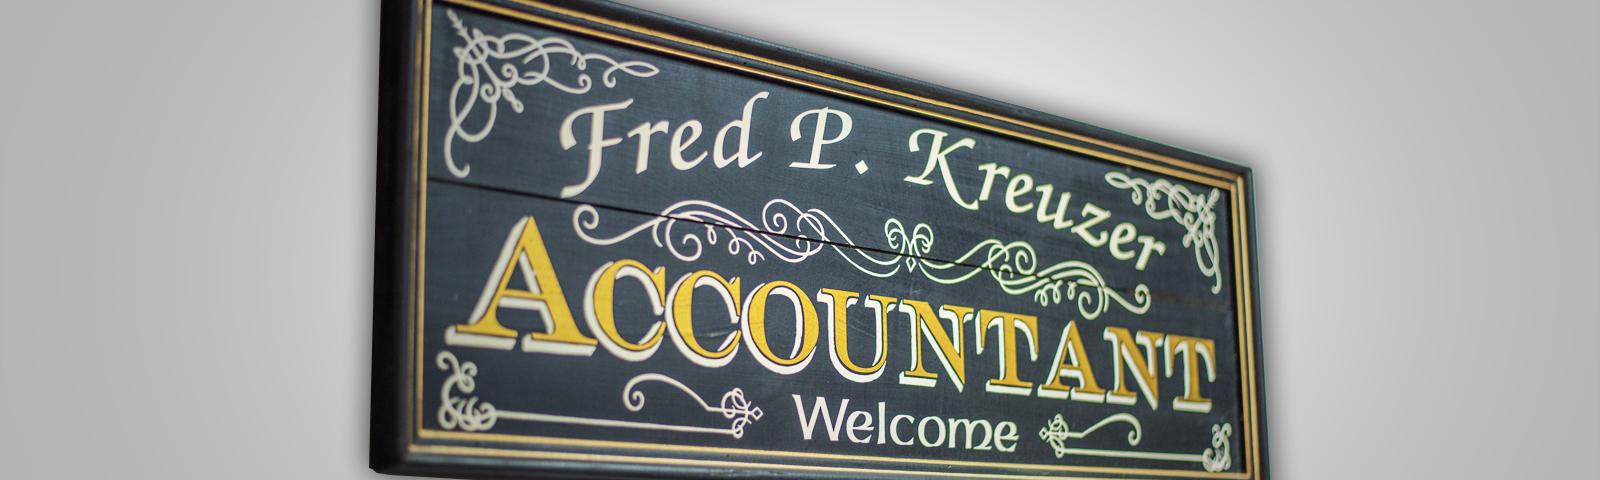 Fred Kreuzer CPA & Associates